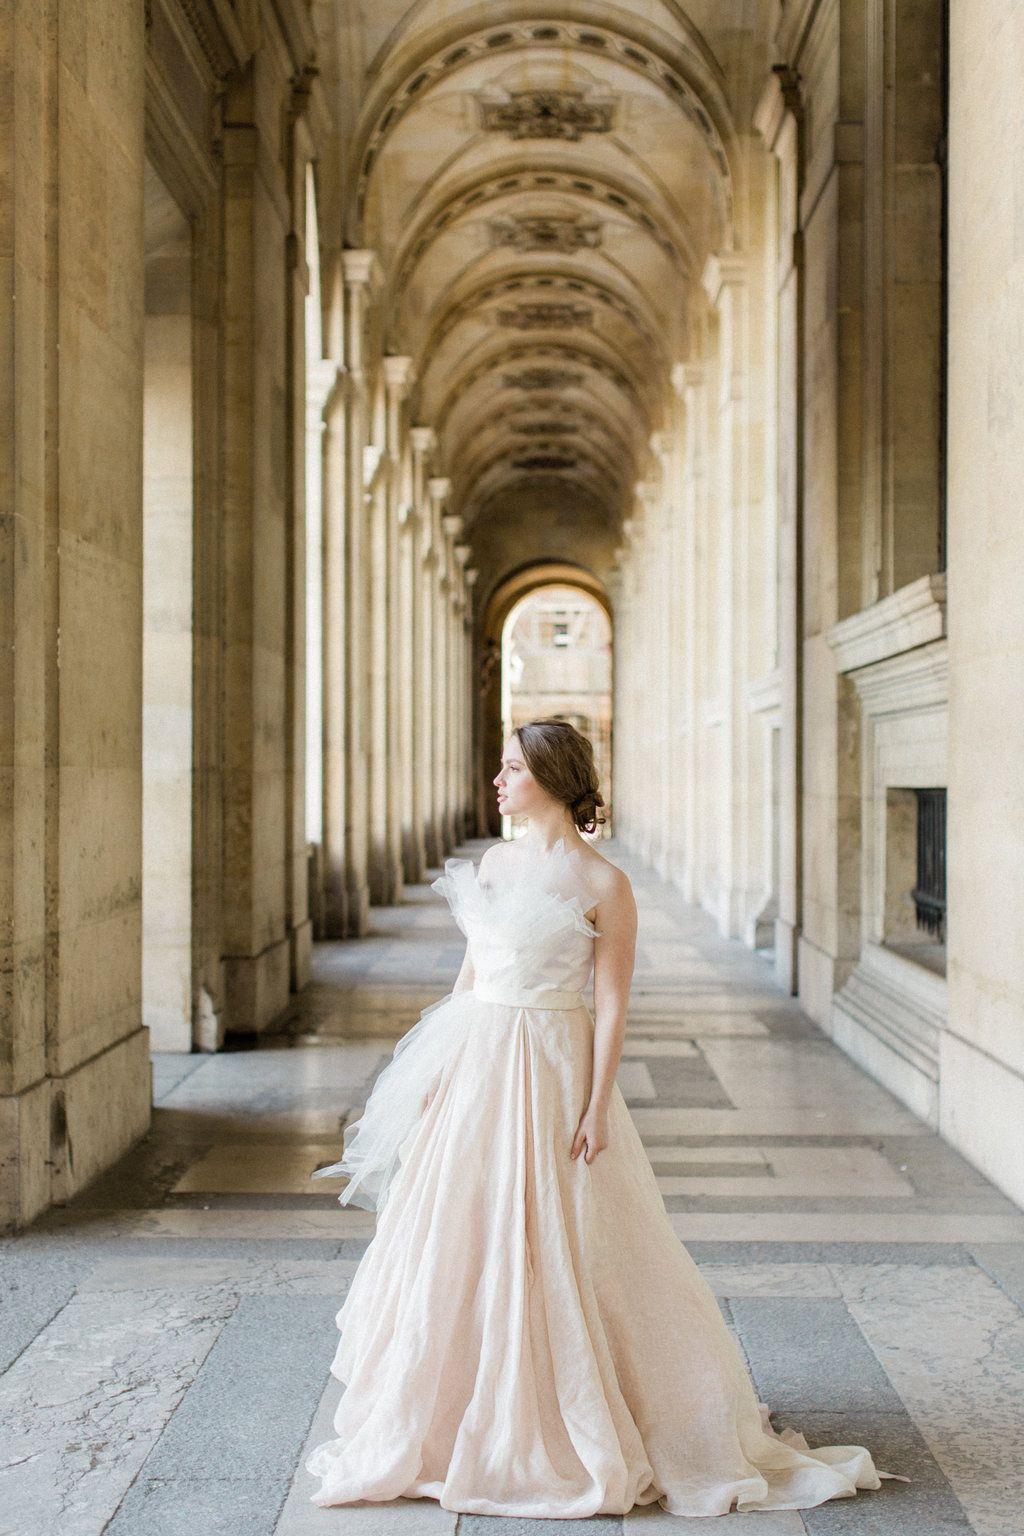 Timeless Paris Elopement by Danielle Harris Photography